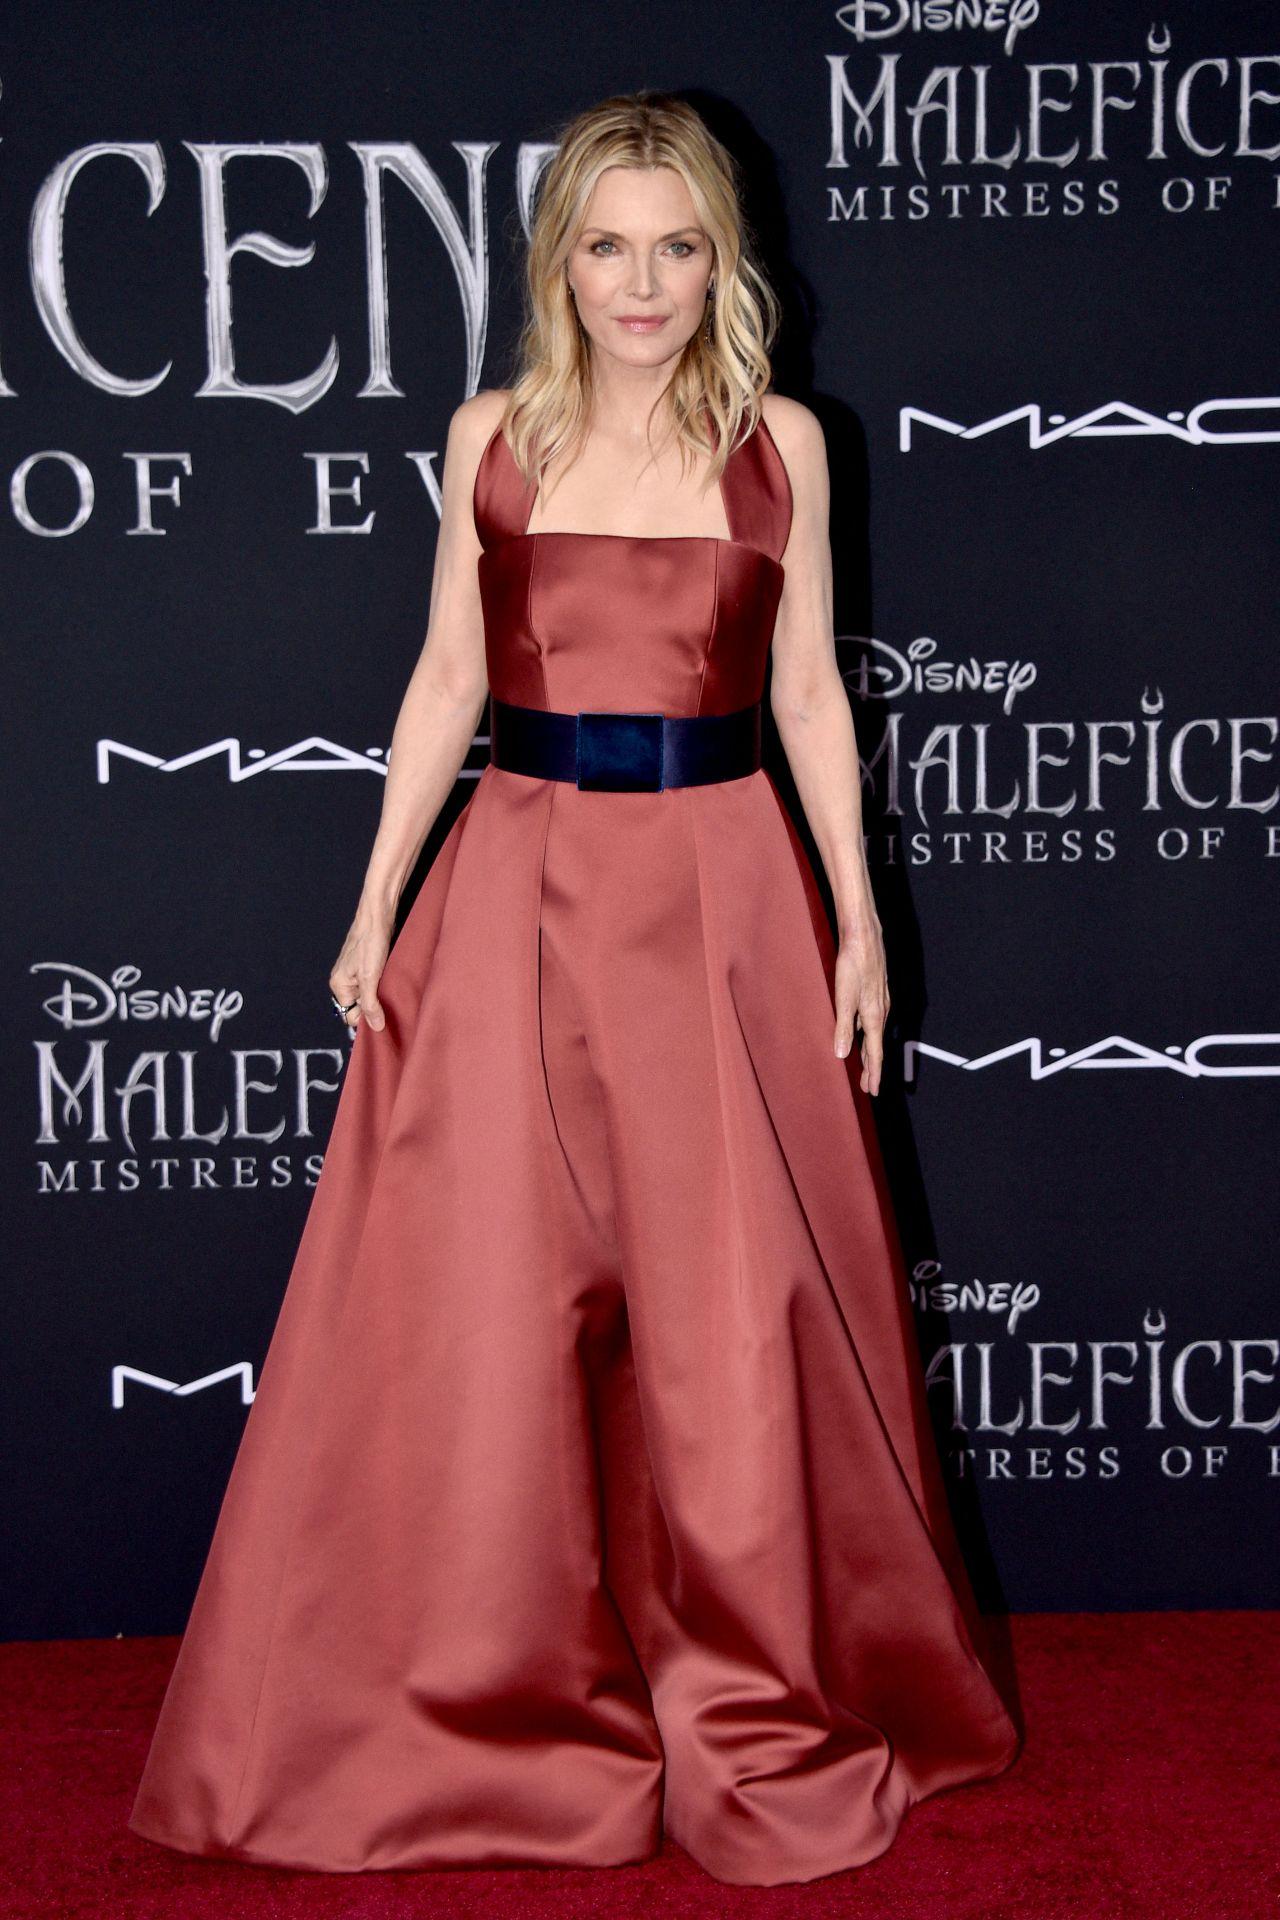 Michelle Pfeiffer Maleficent Mistress Of Evil Premiere